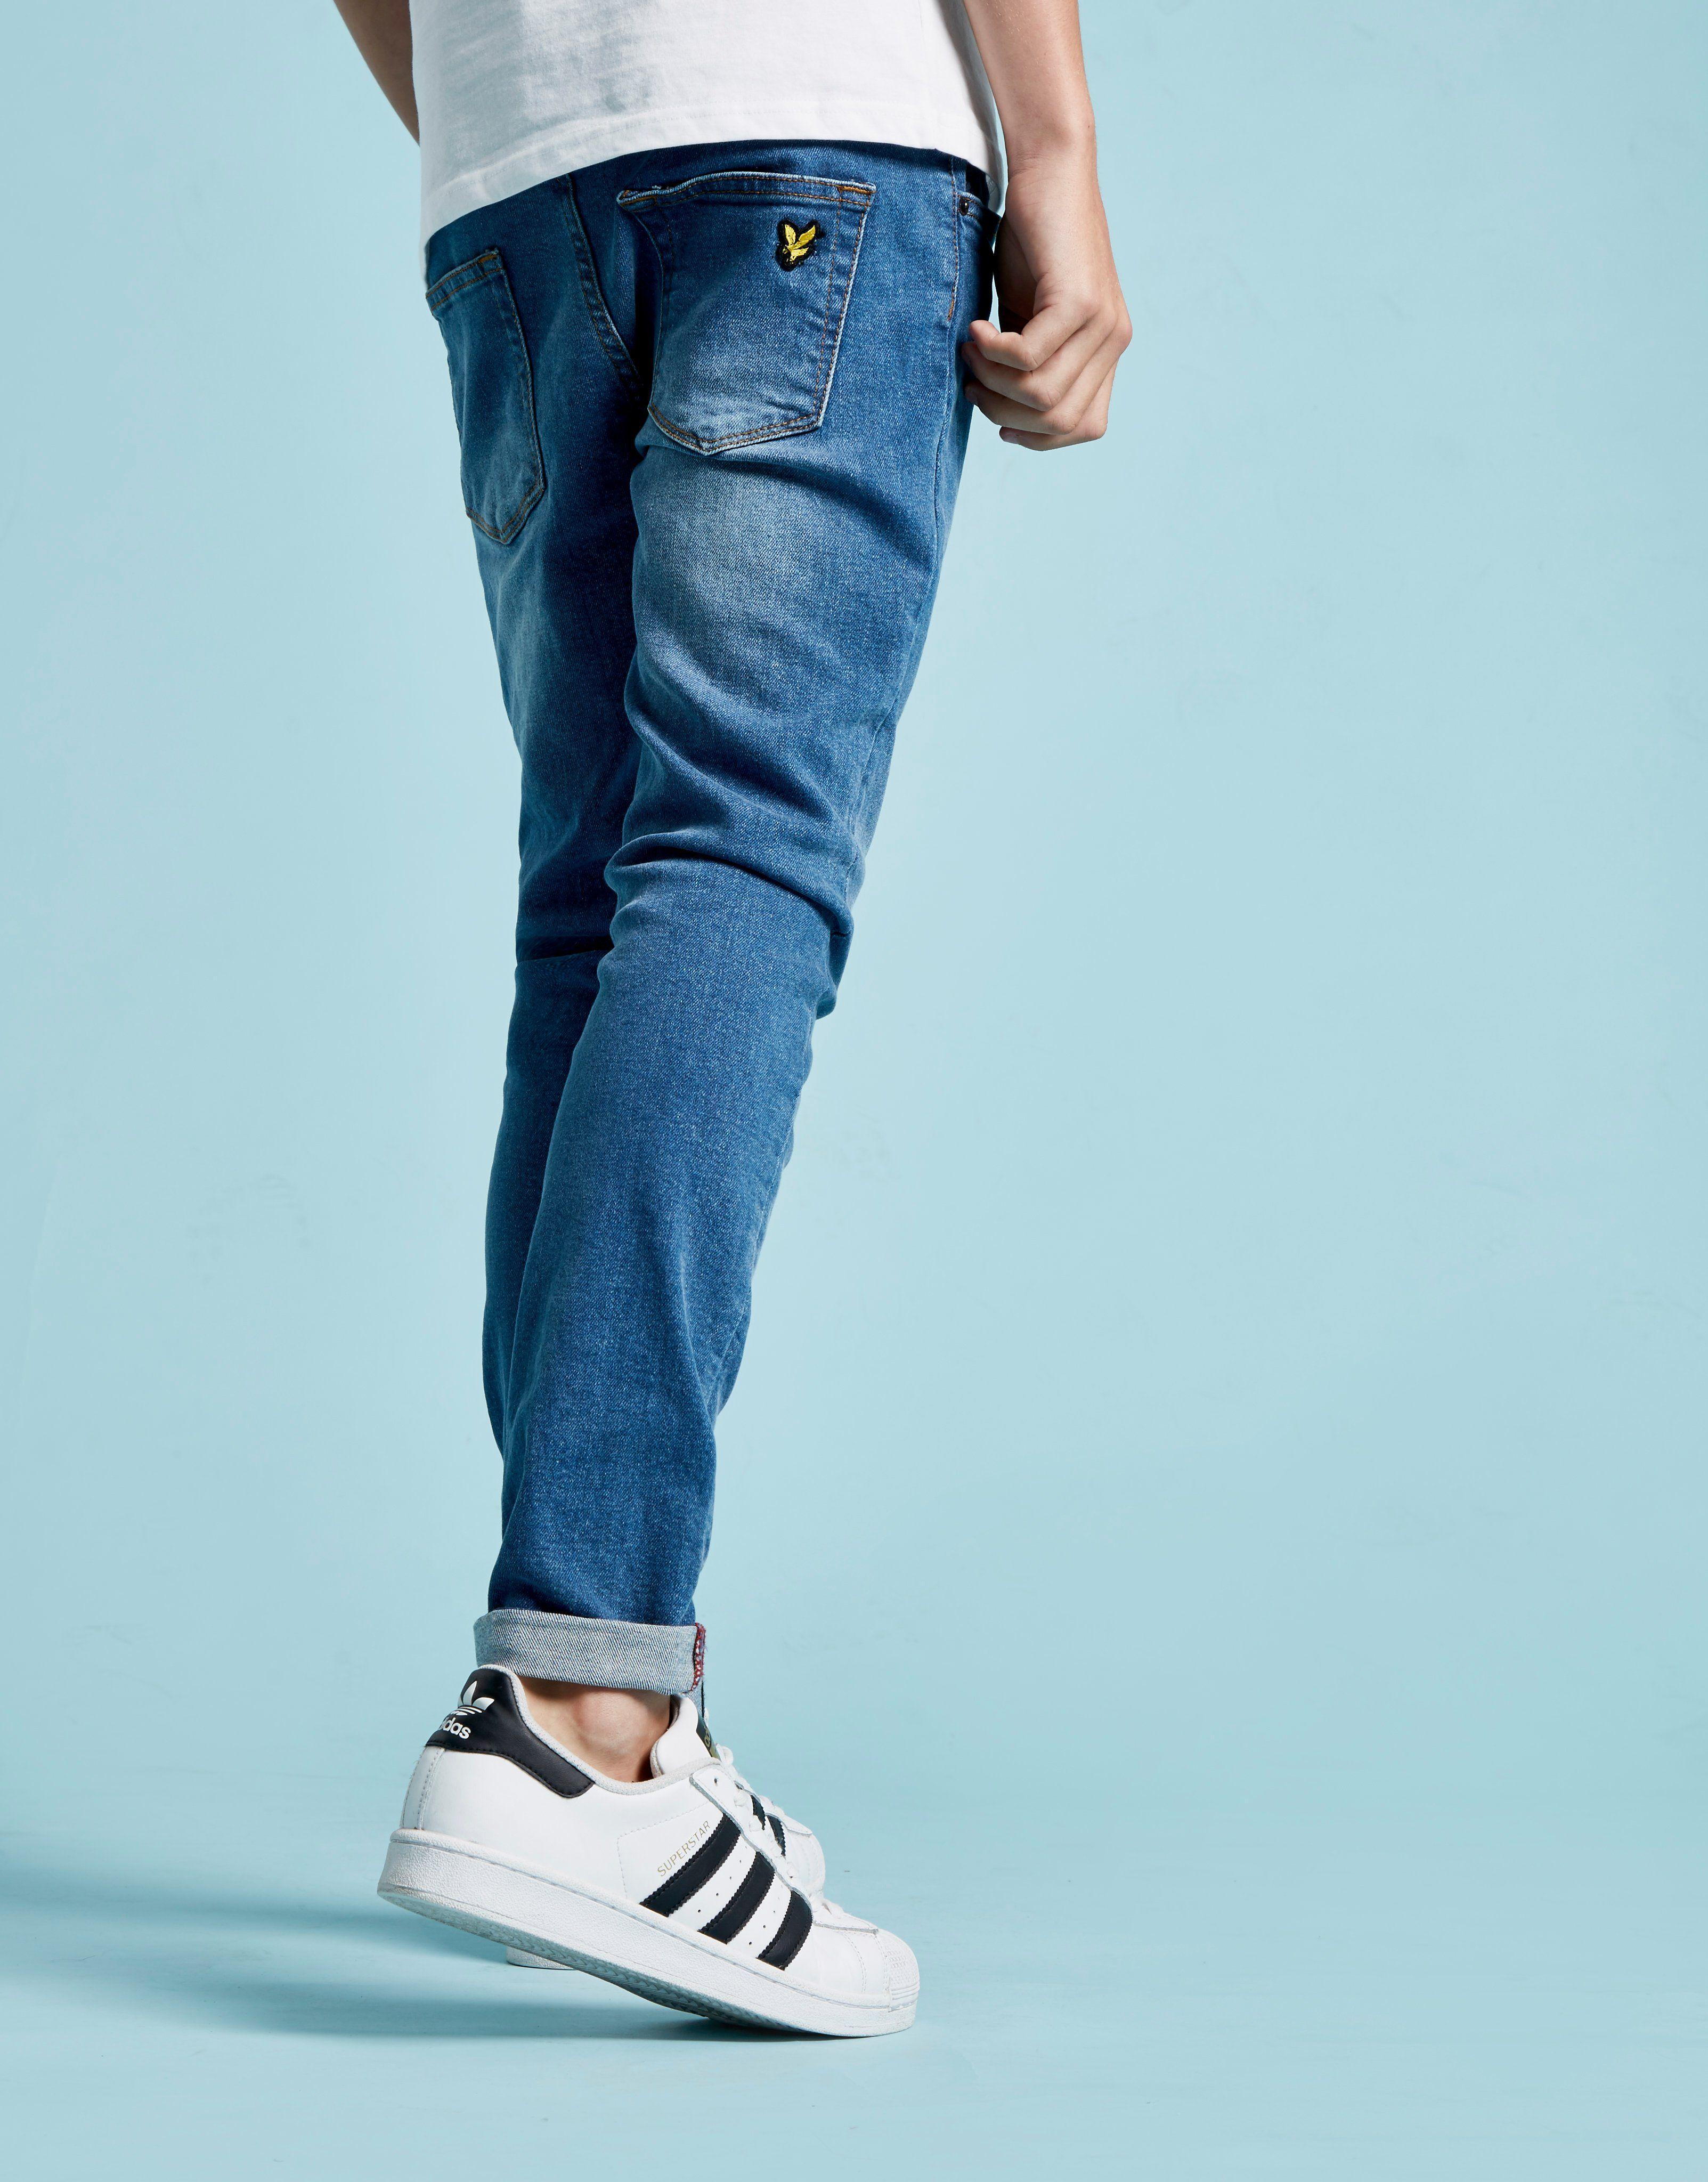 adidas Originals Trefoil Skinny Jeans